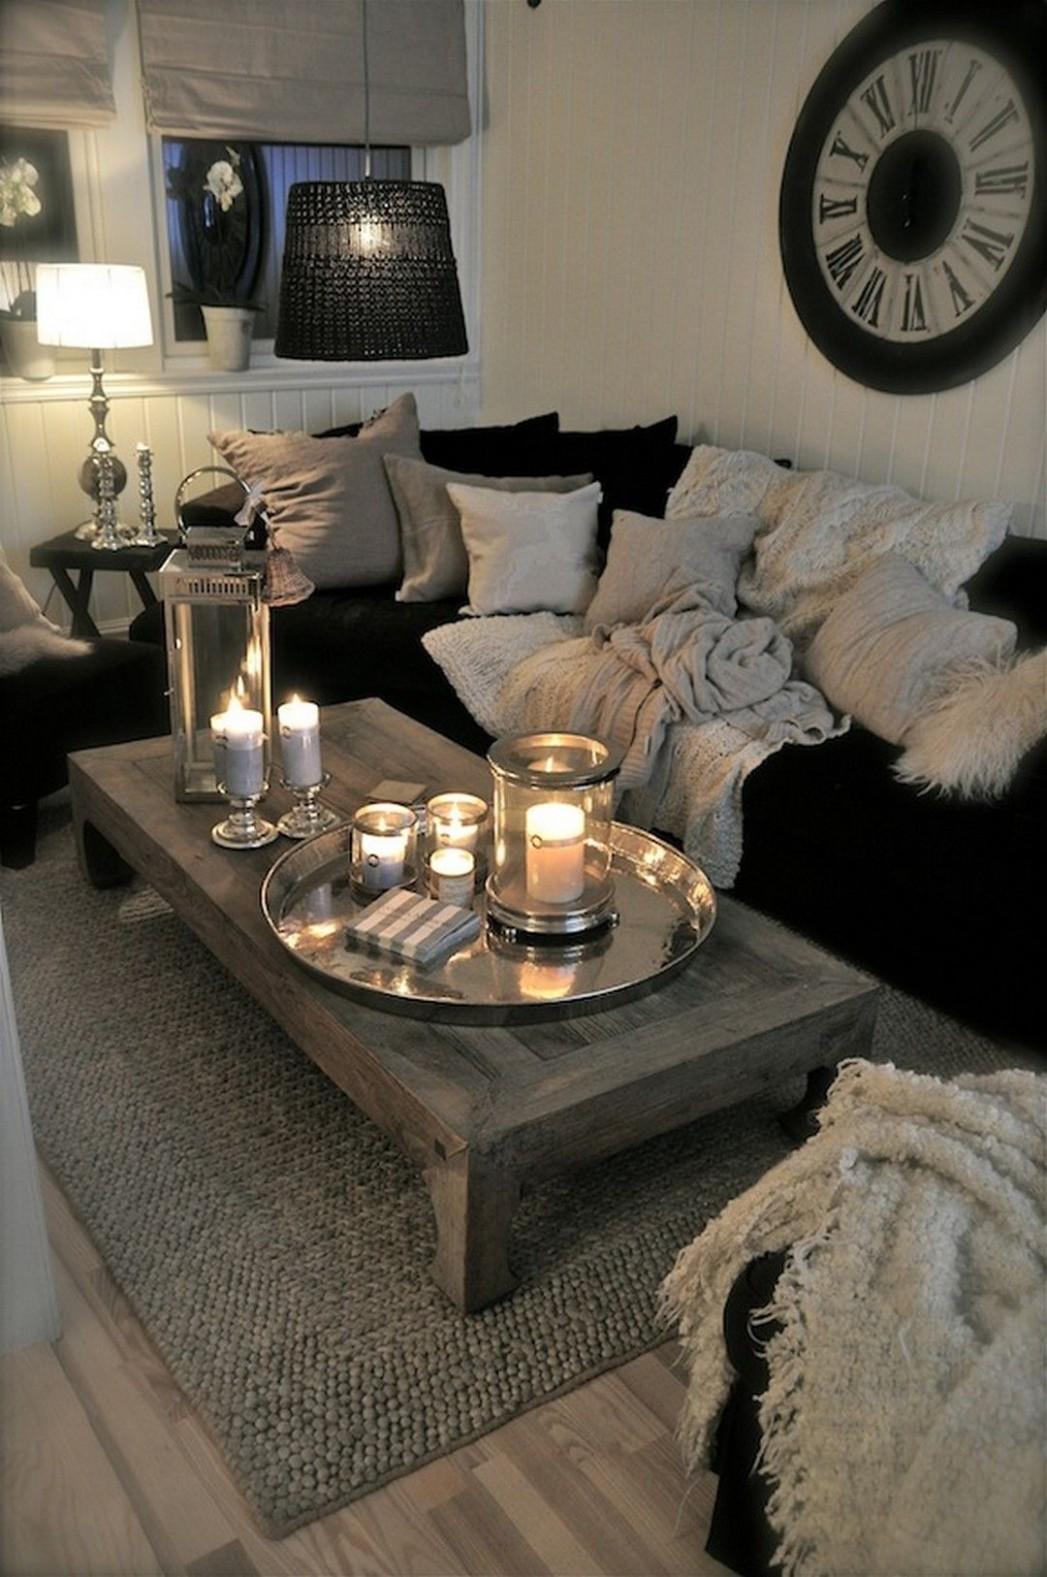 11 Pinterest Home Decor Living Room 11 in 11  Apartment  - Apartment Room Ideas Pinterest